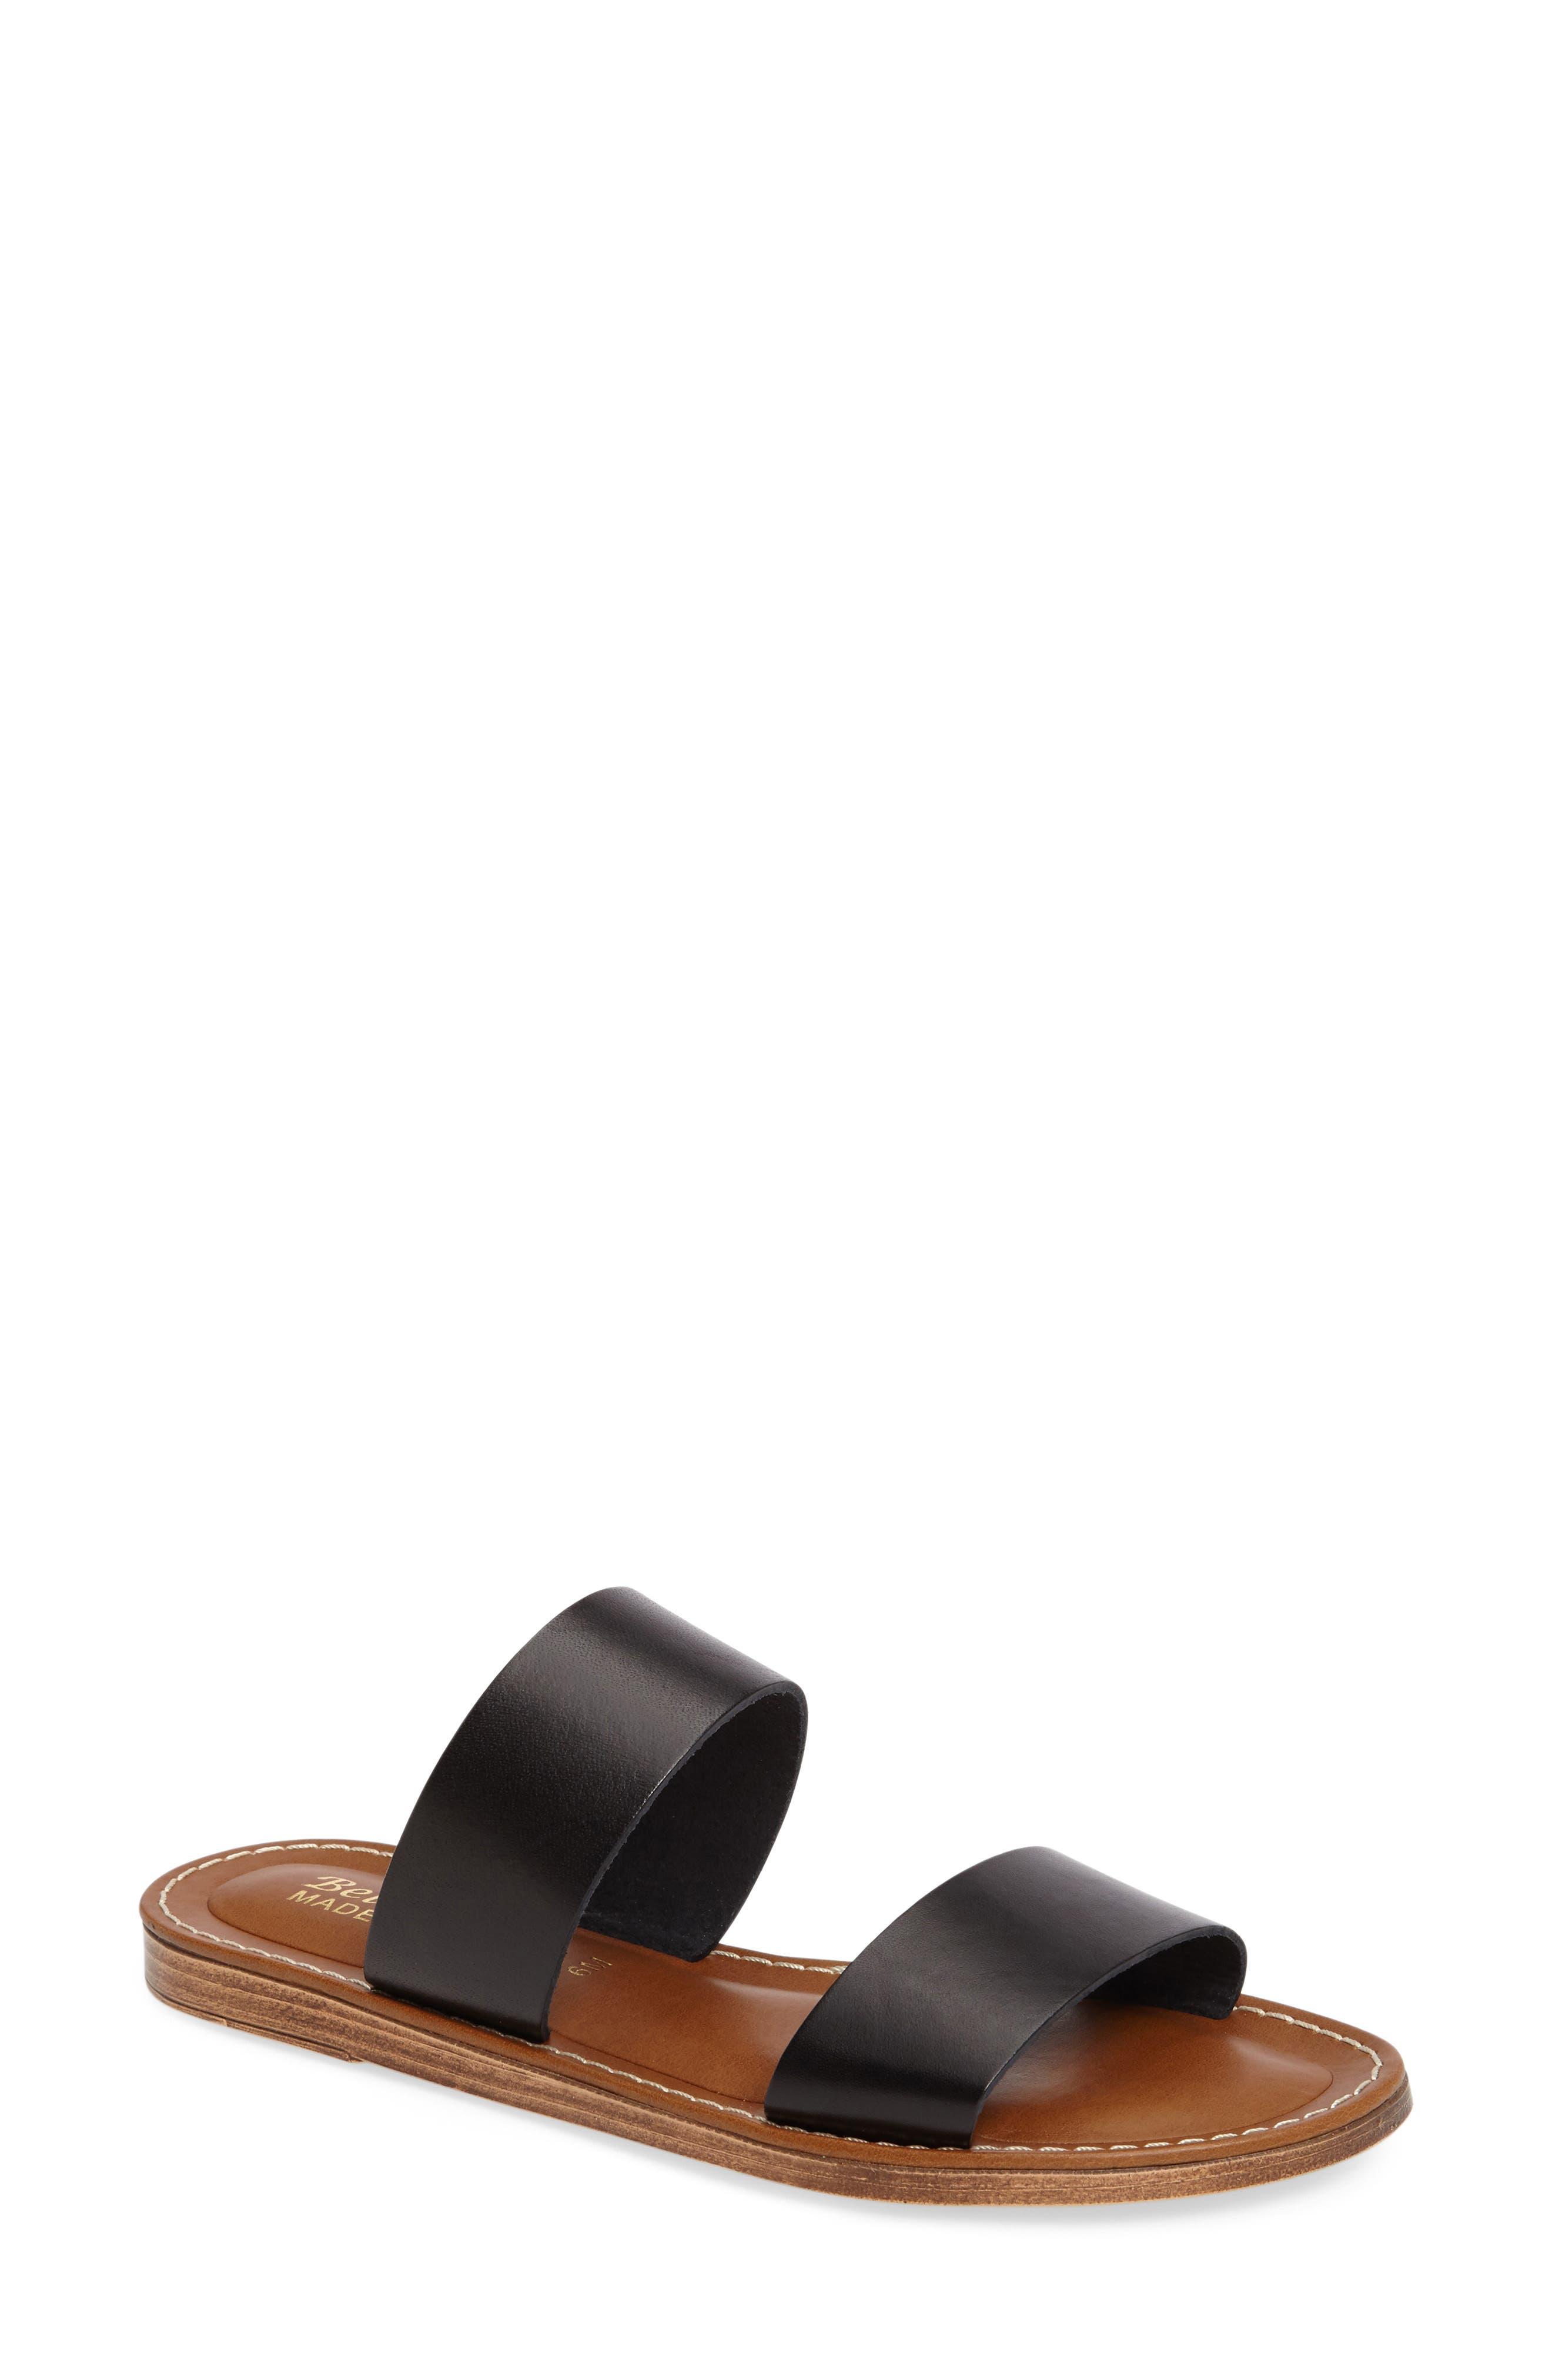 Imo Slide Sandal,                         Main,                         color, BLACK LEATHER